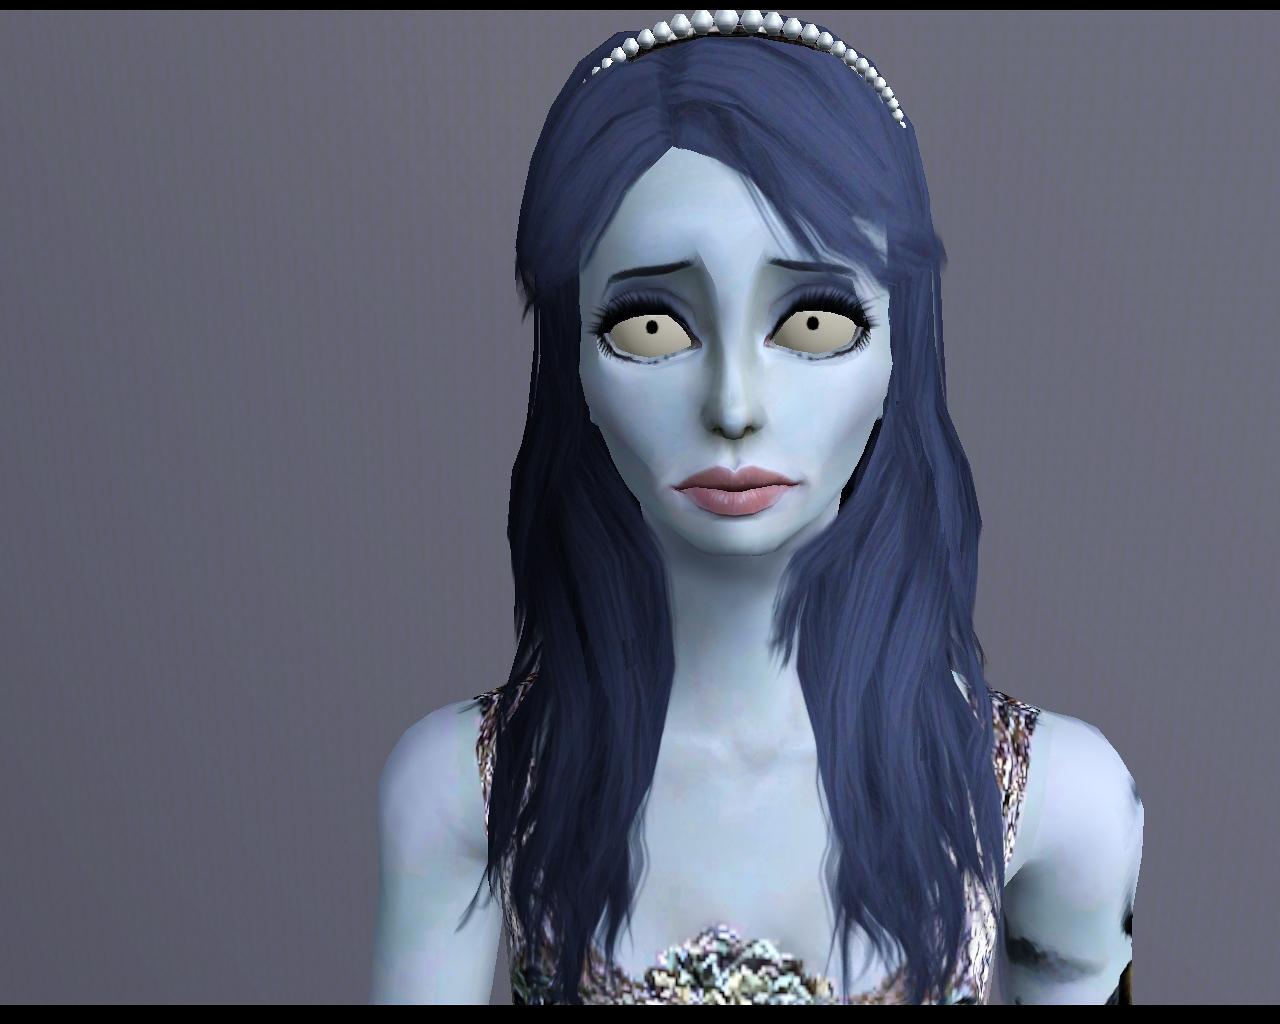 Sims 3 Celebrity